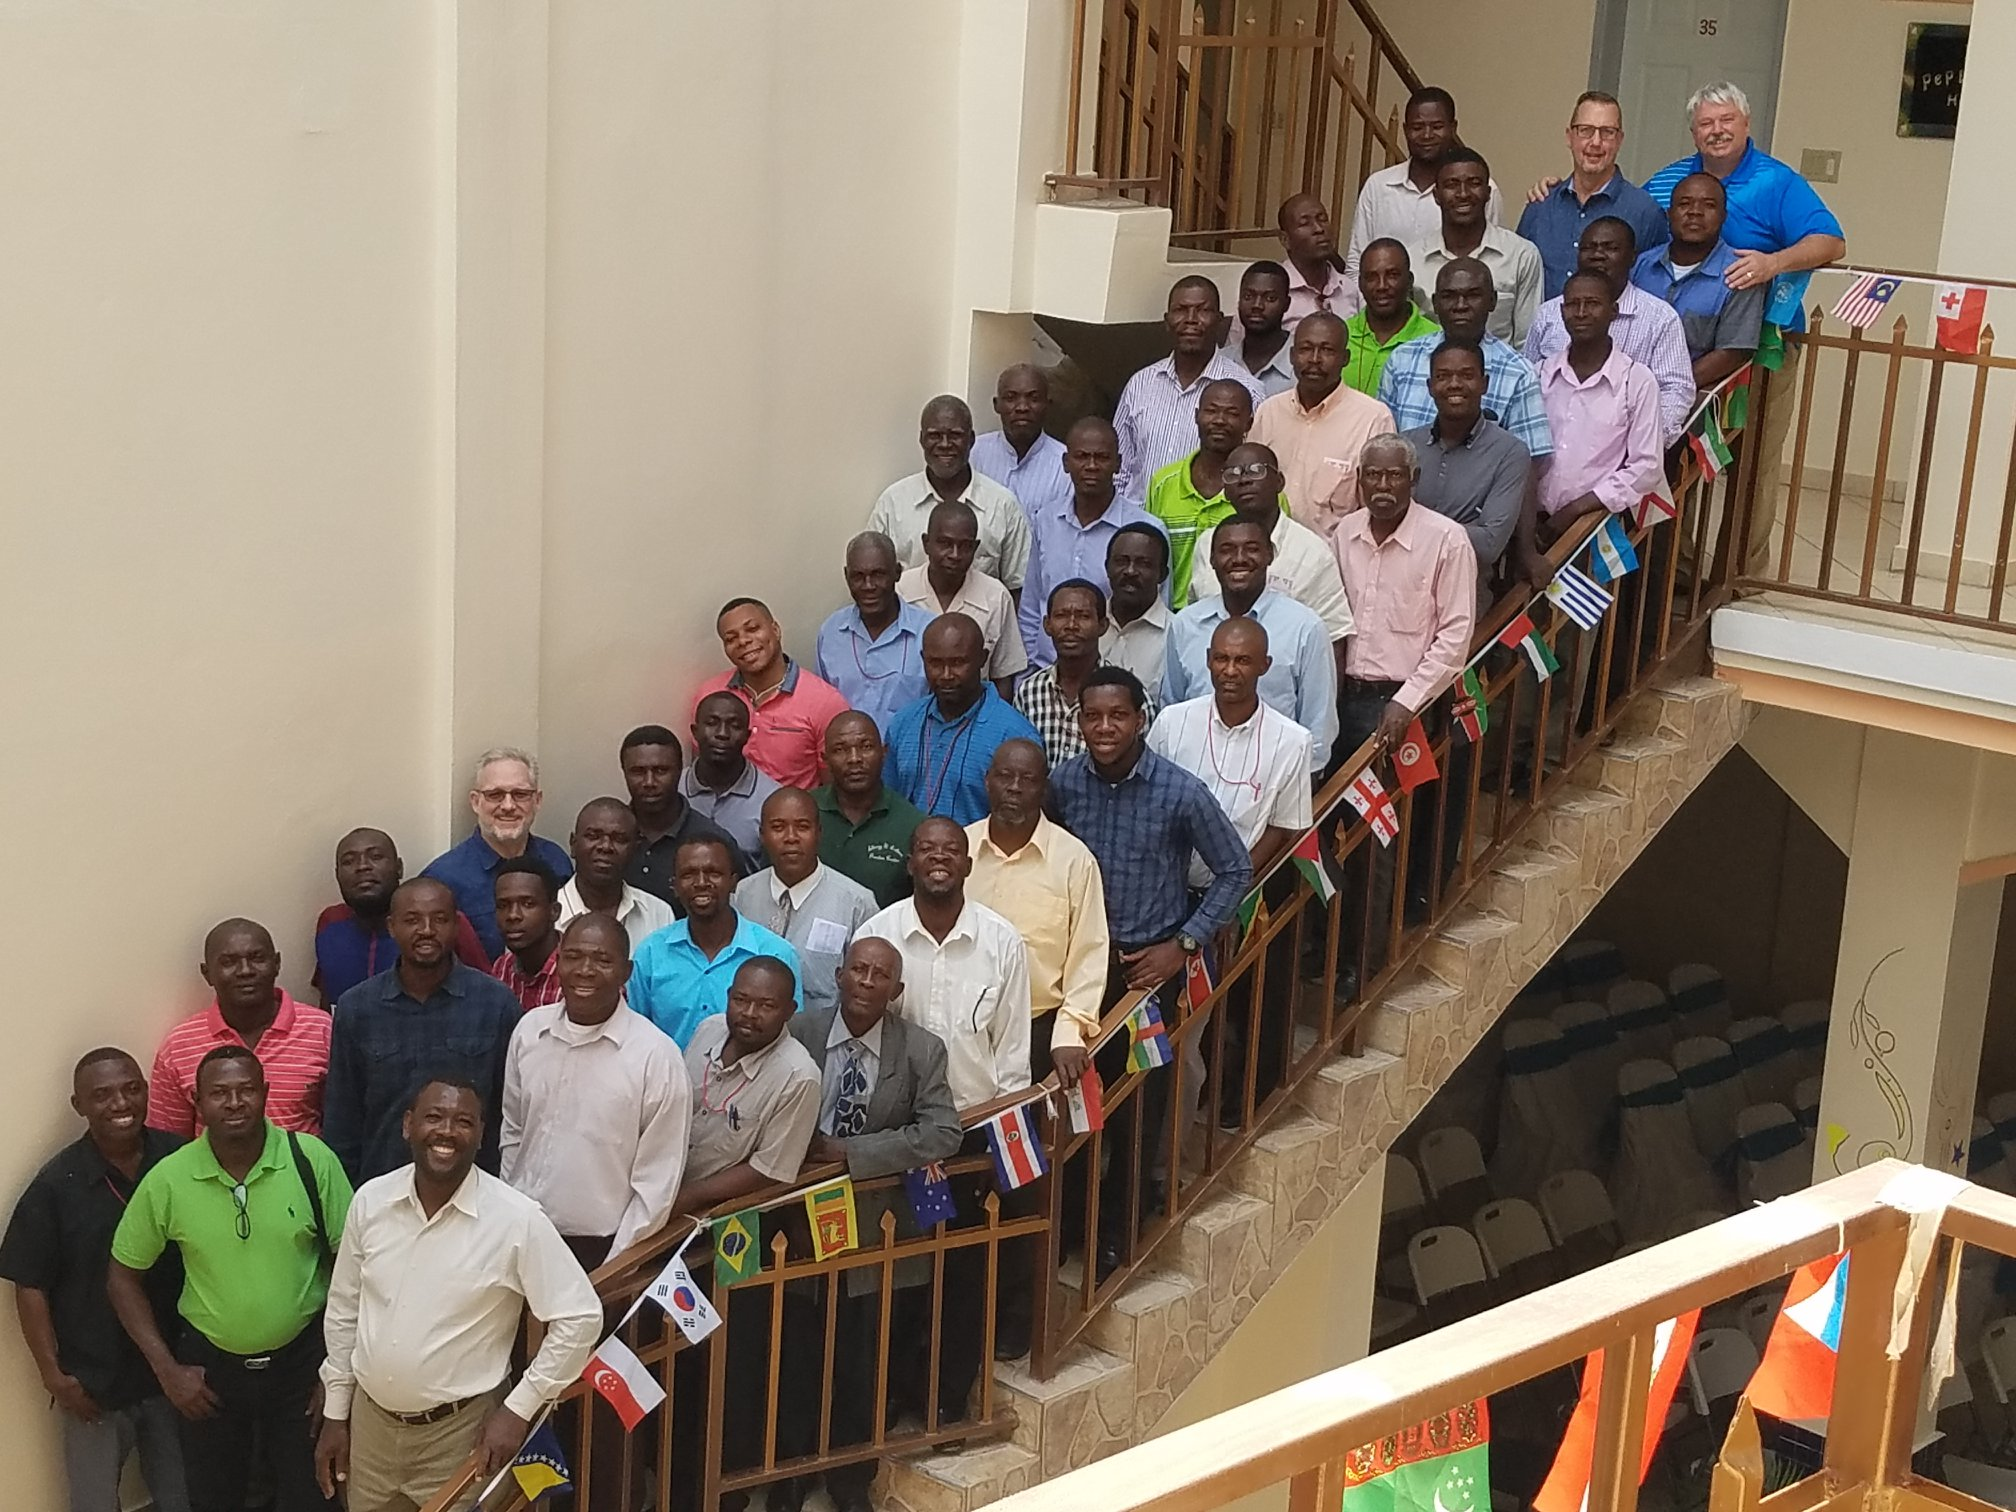 Haiti Pastor Training Graduation 1.jpg